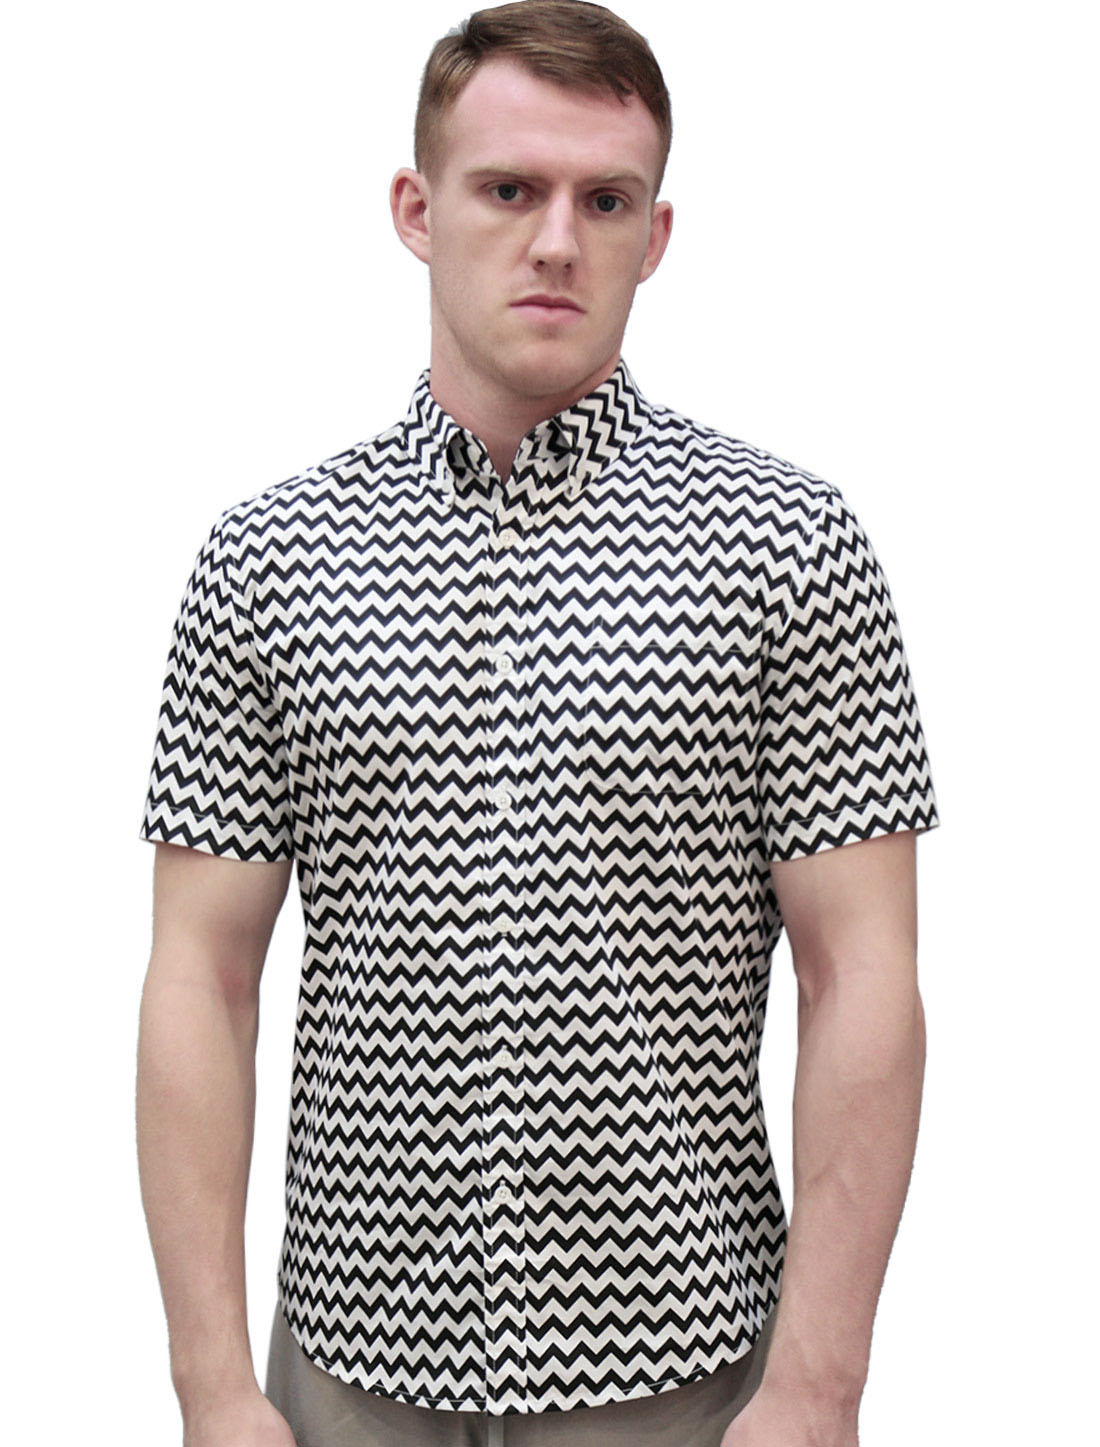 Men Chevron Print Short Sleeves Pocket Shirt Black White L